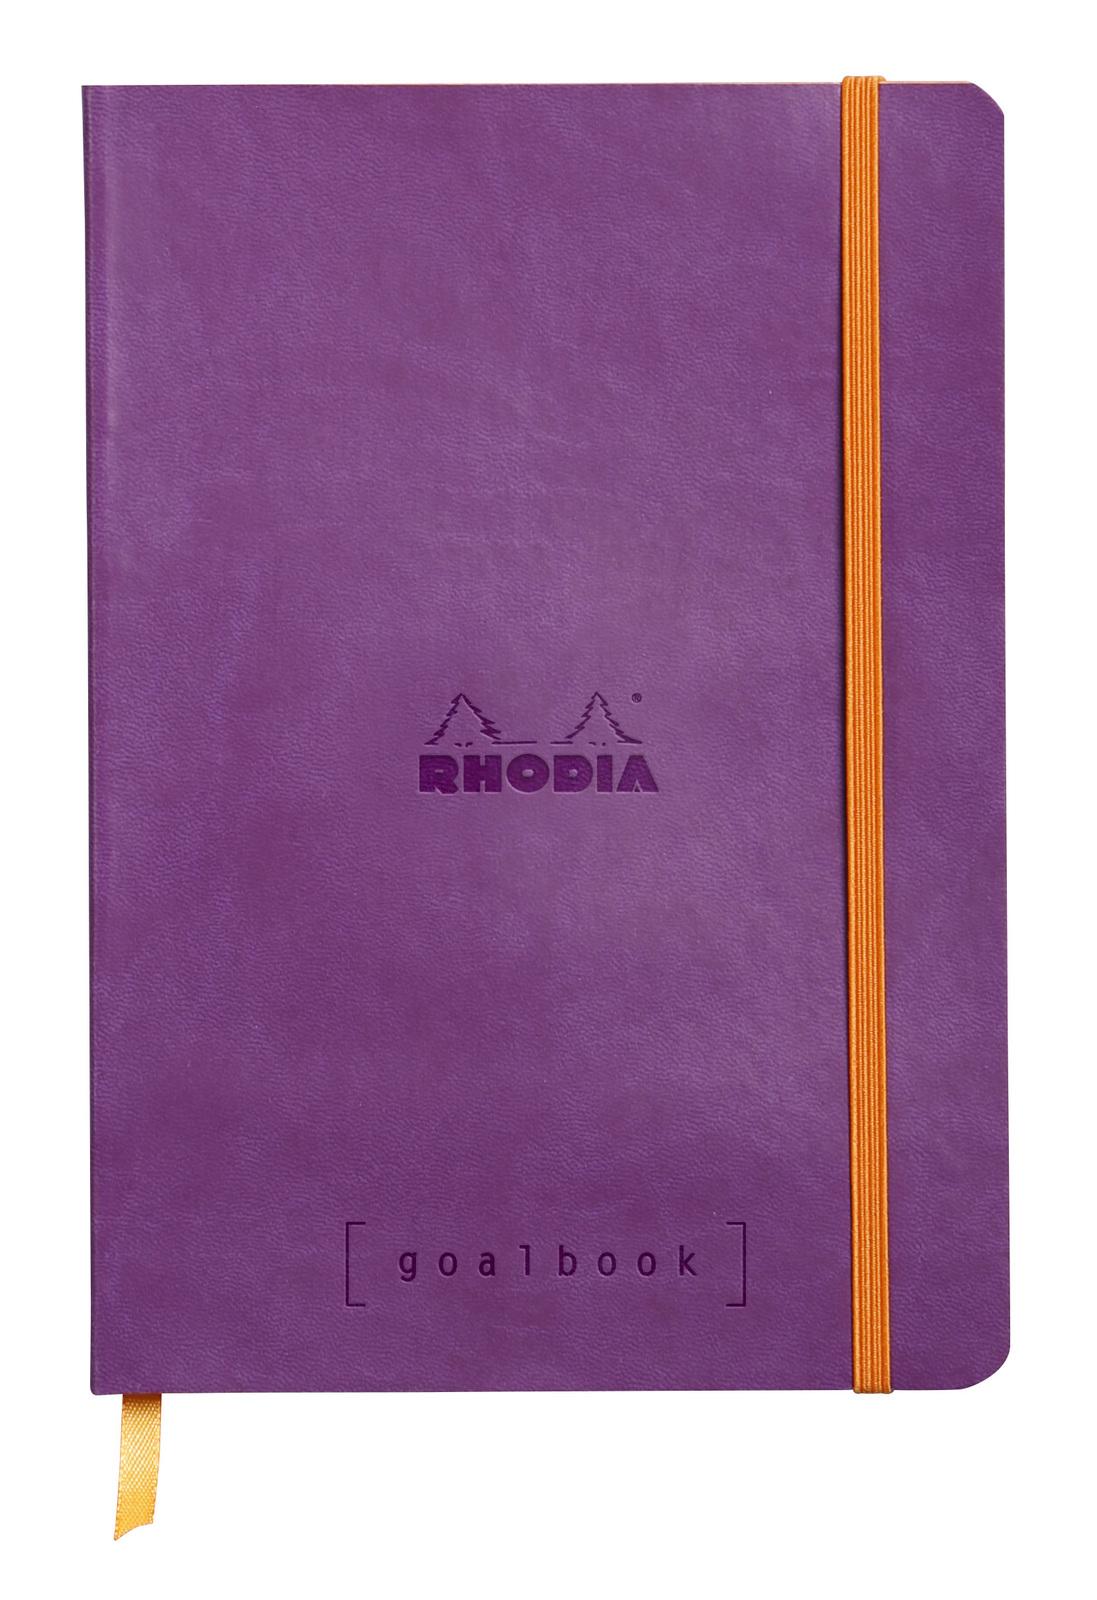 Rhodiarama A5 Goalbook Dot Grid - Violet image